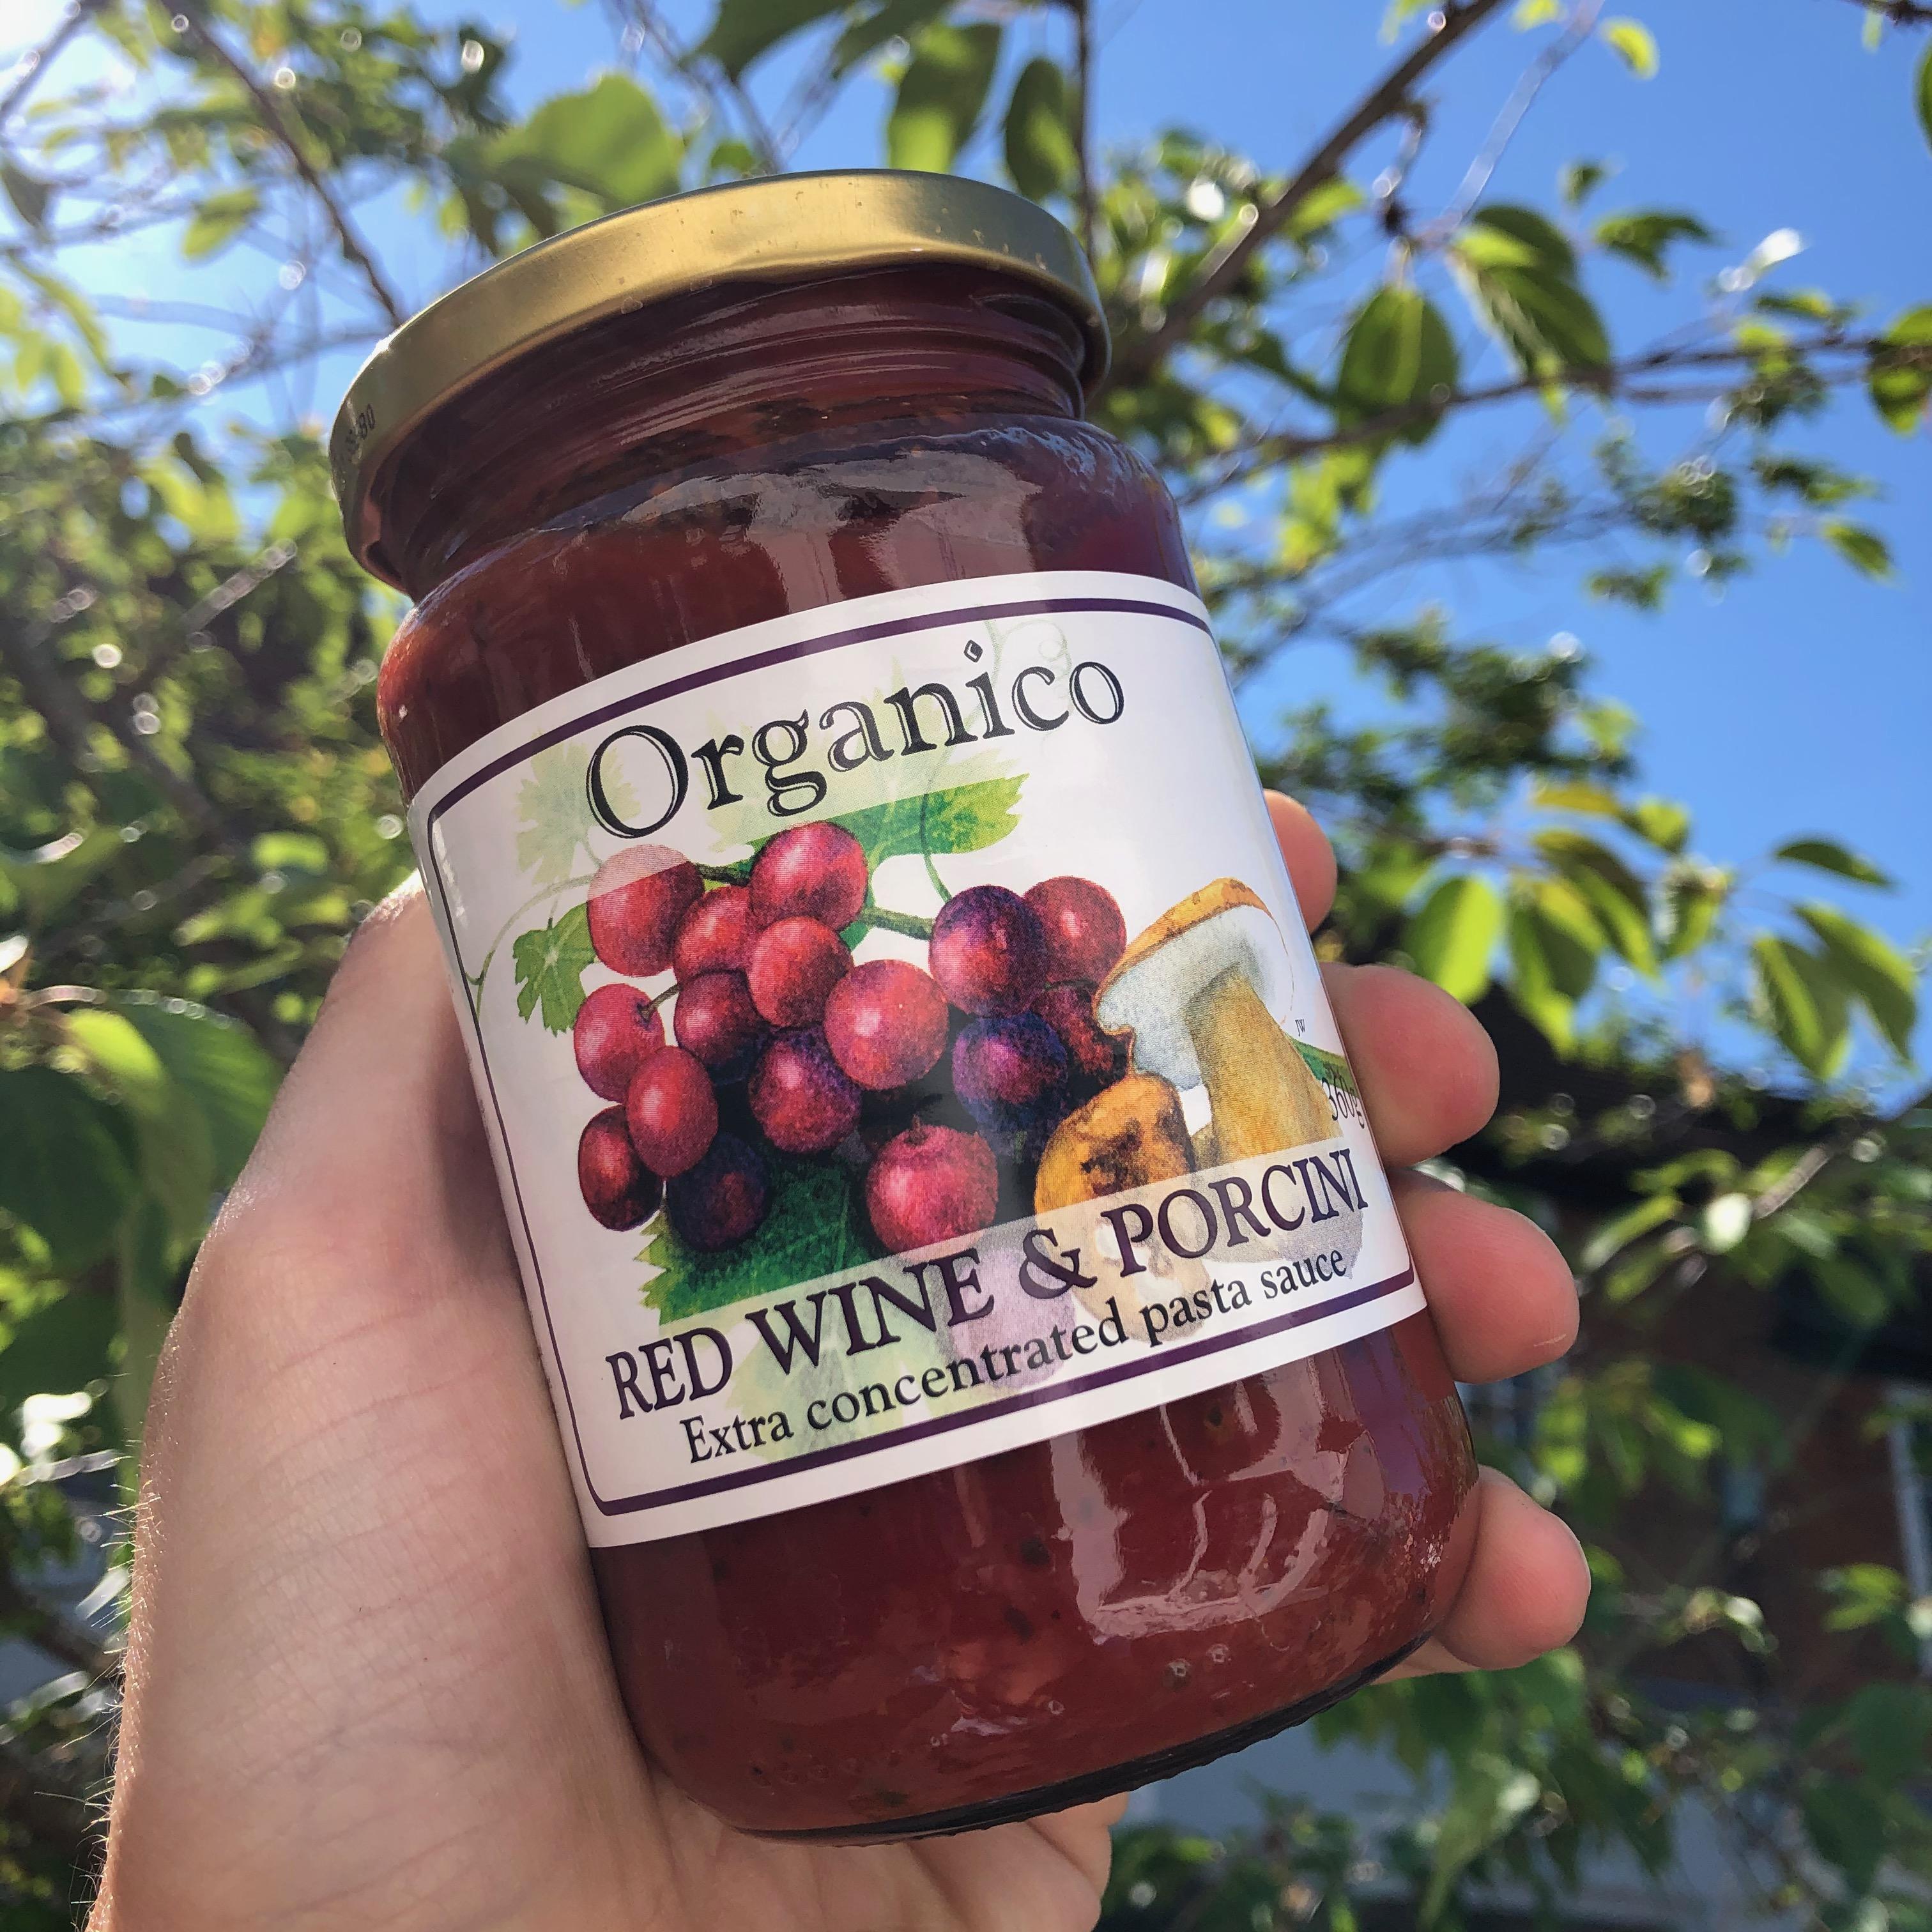 Organico Red Wine & Porcini Sauce 360g